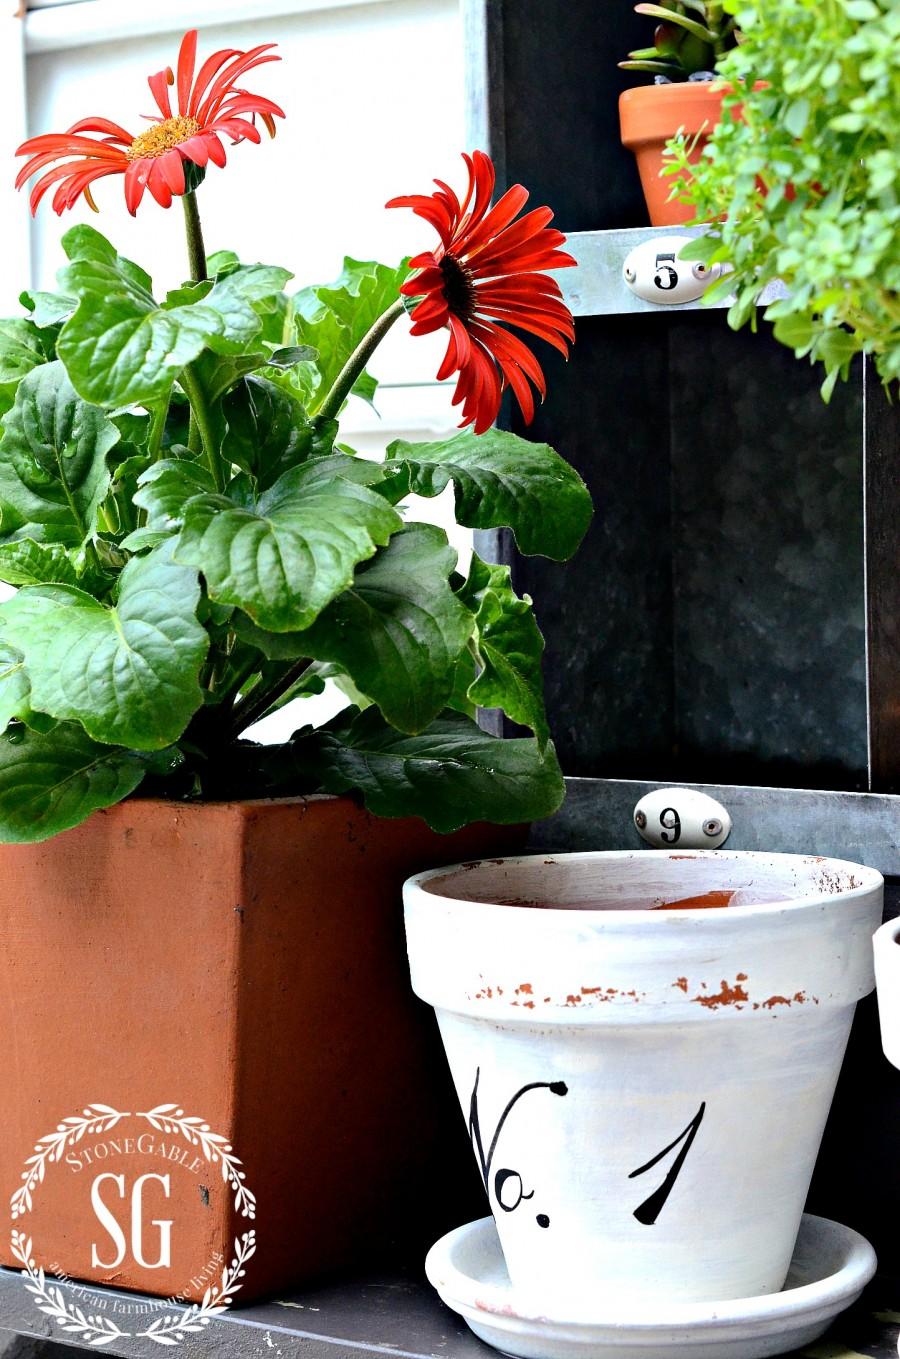 SUMMER POTTING BENCH-red gerbera daisies-stonegableblog.com